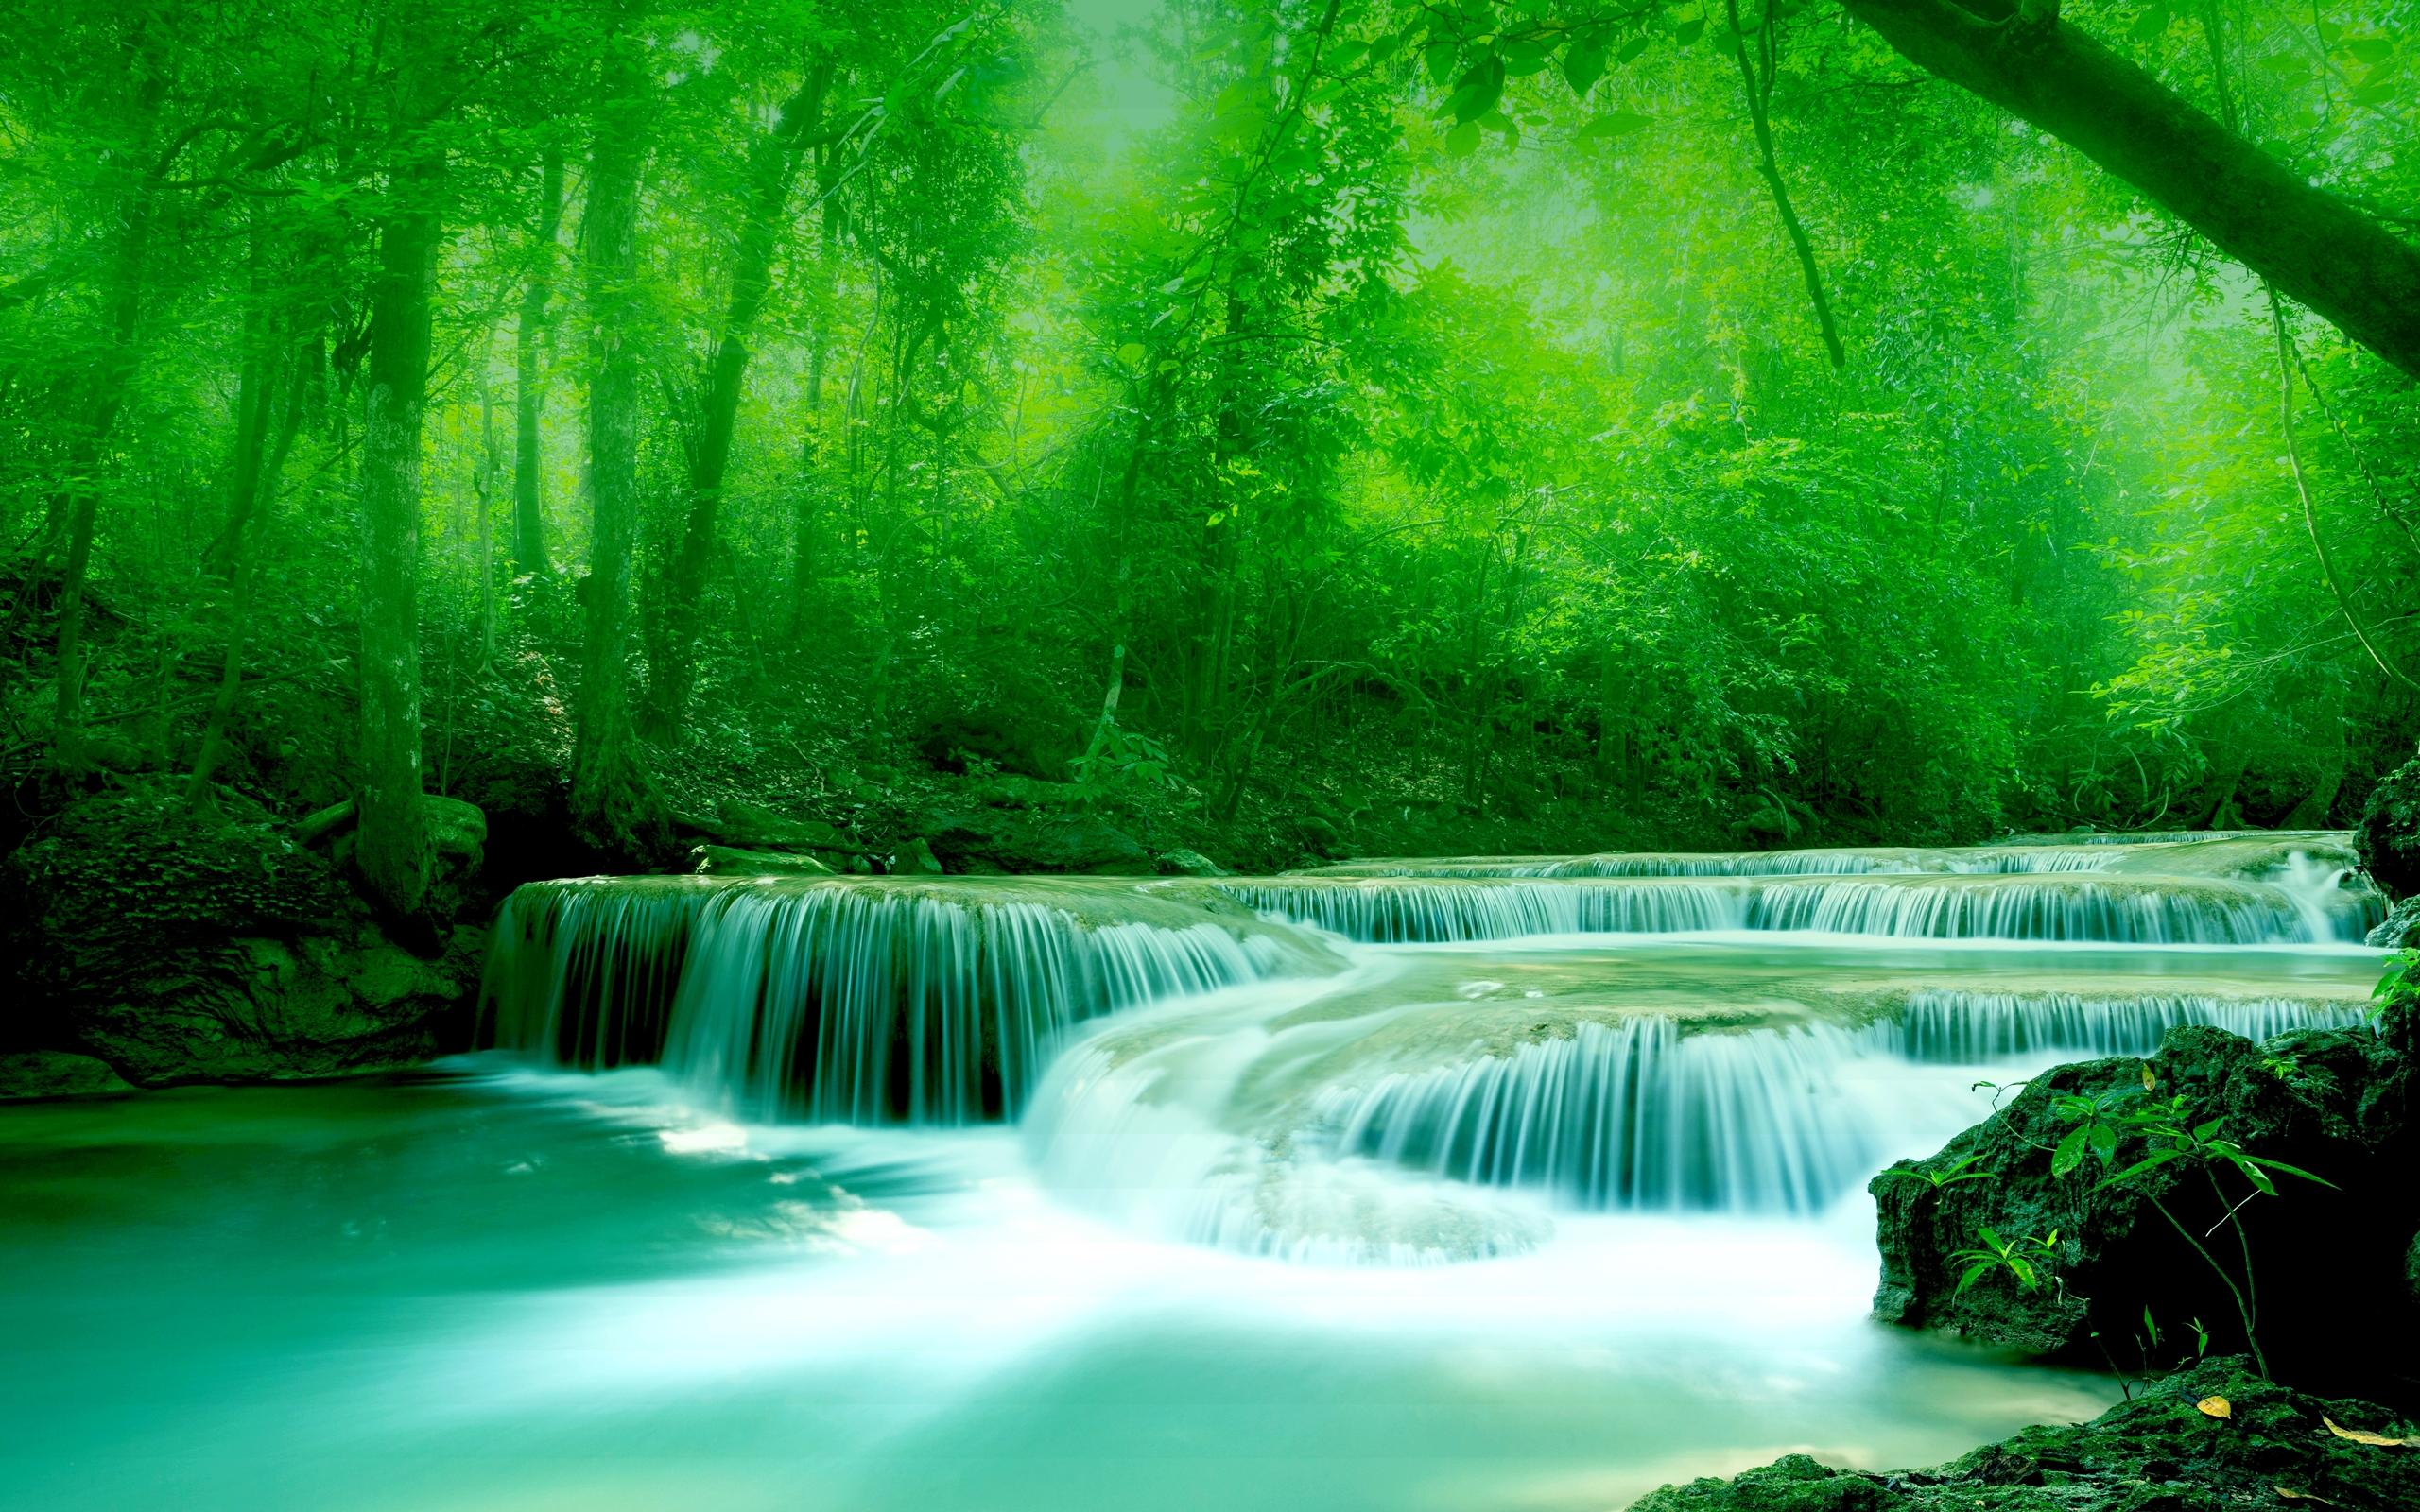 Niagara Falls Full Hd Wallpaper Wallpaper River Water Rocks Trees Greenery Free